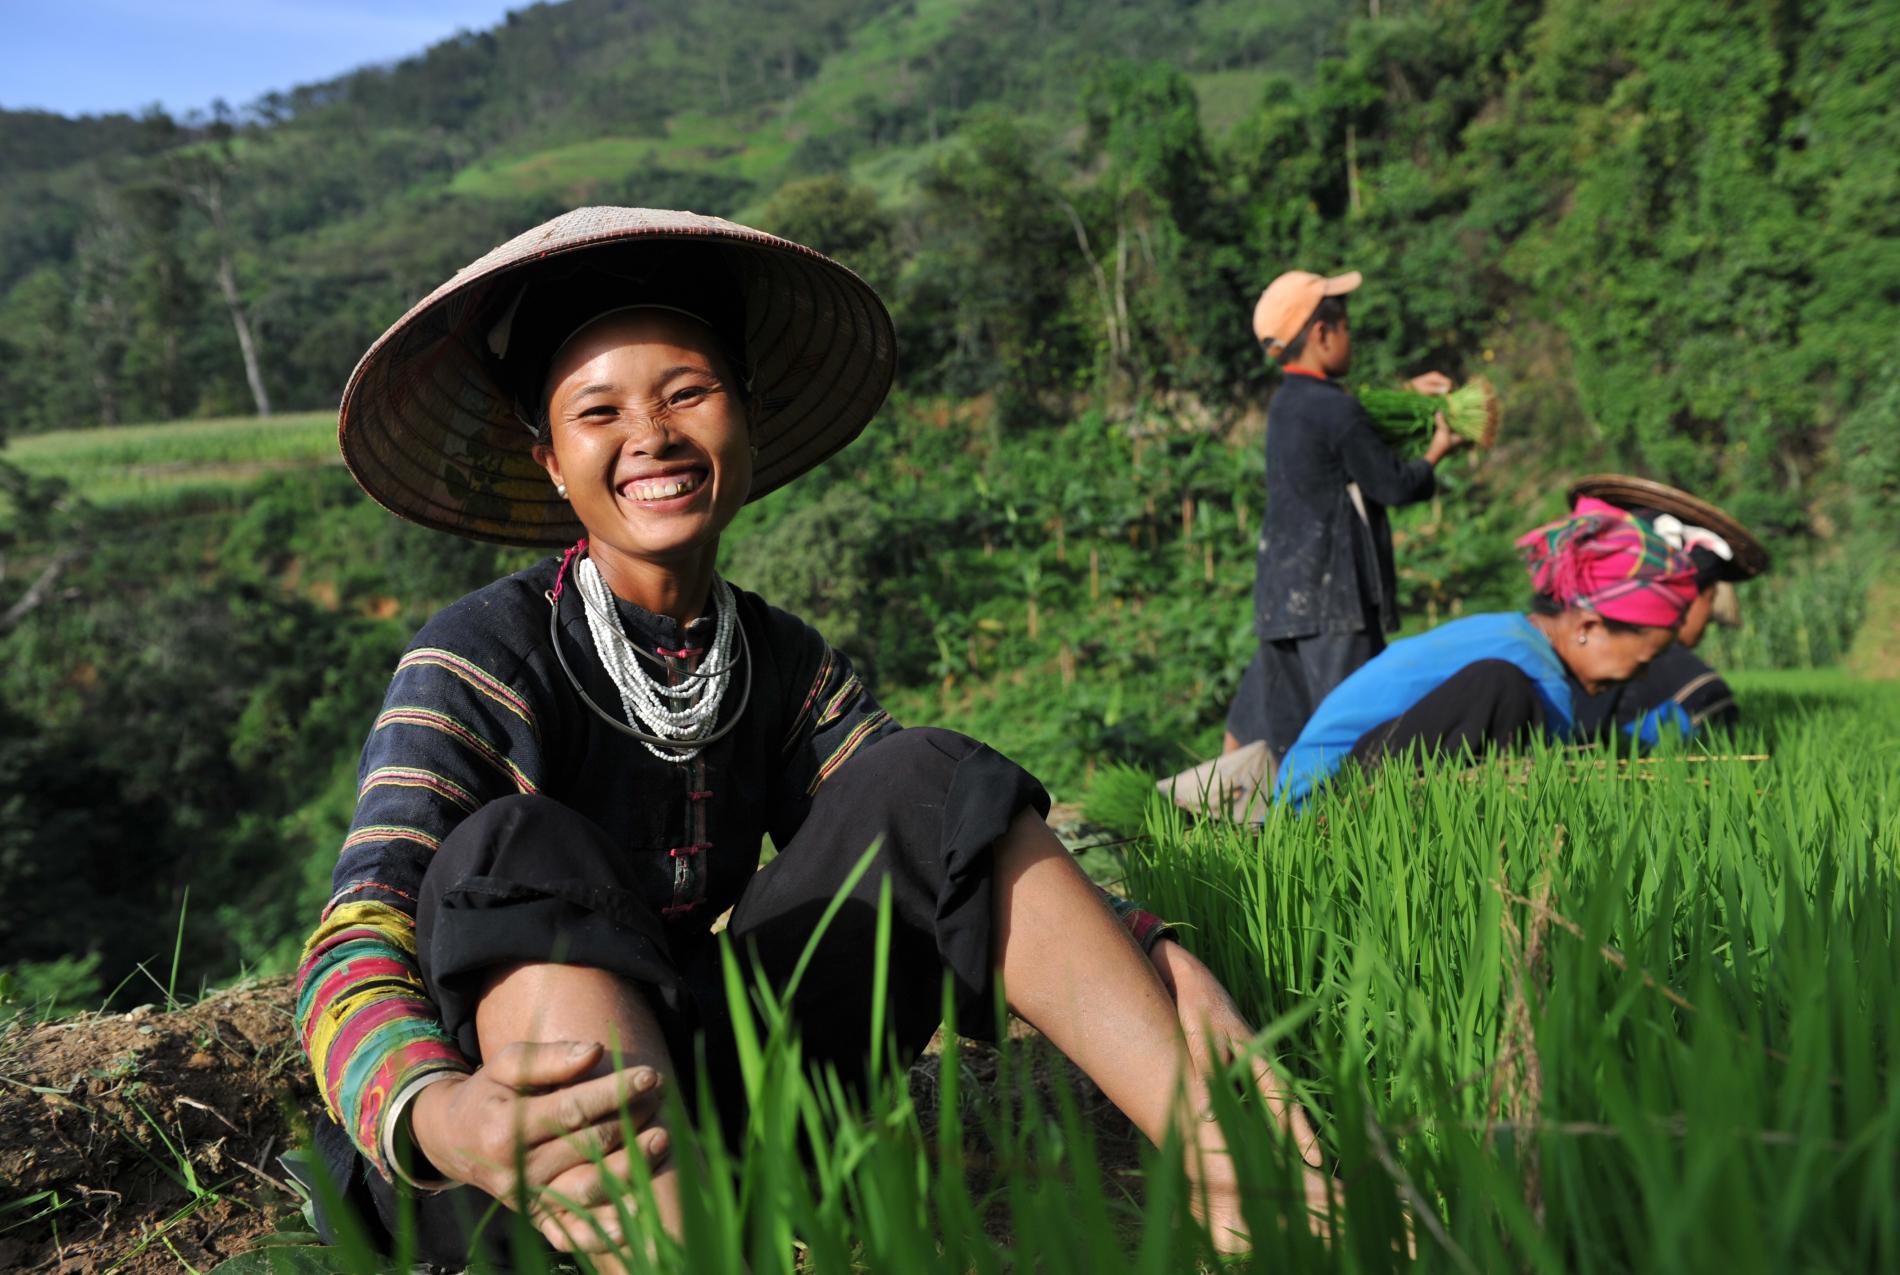 Voyage solidaire Vietnam : Vision du Monde - Photo 1